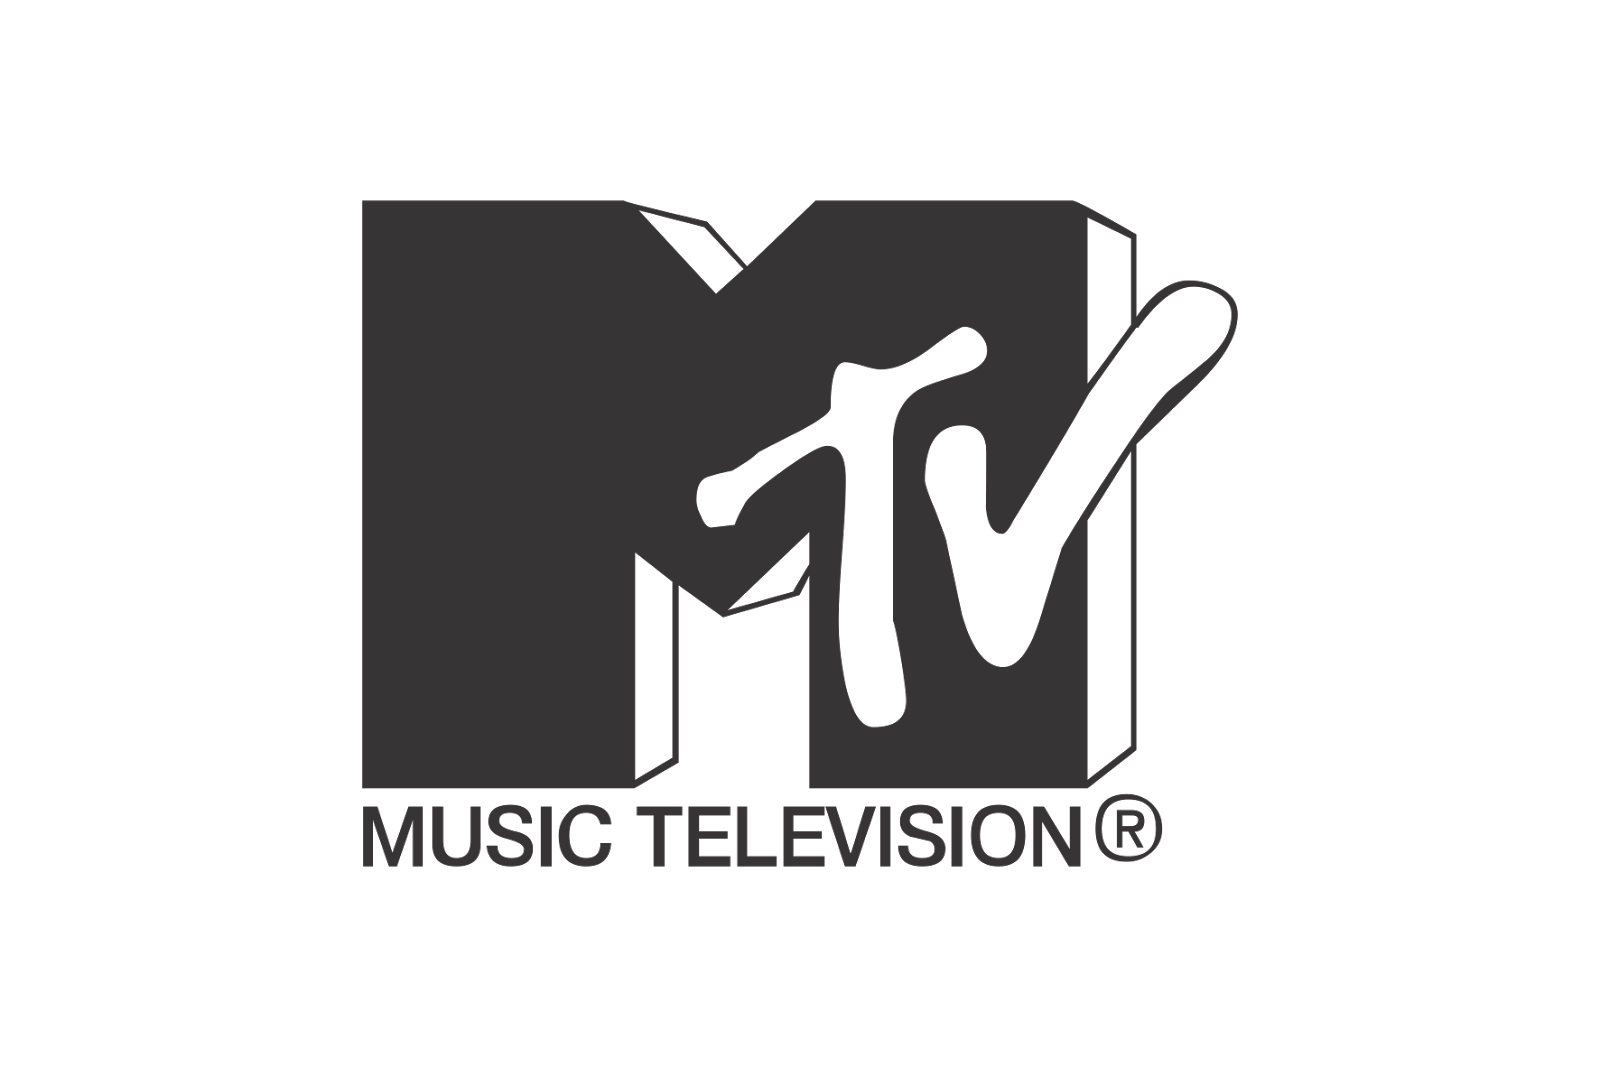 Image Gallery mtv logo